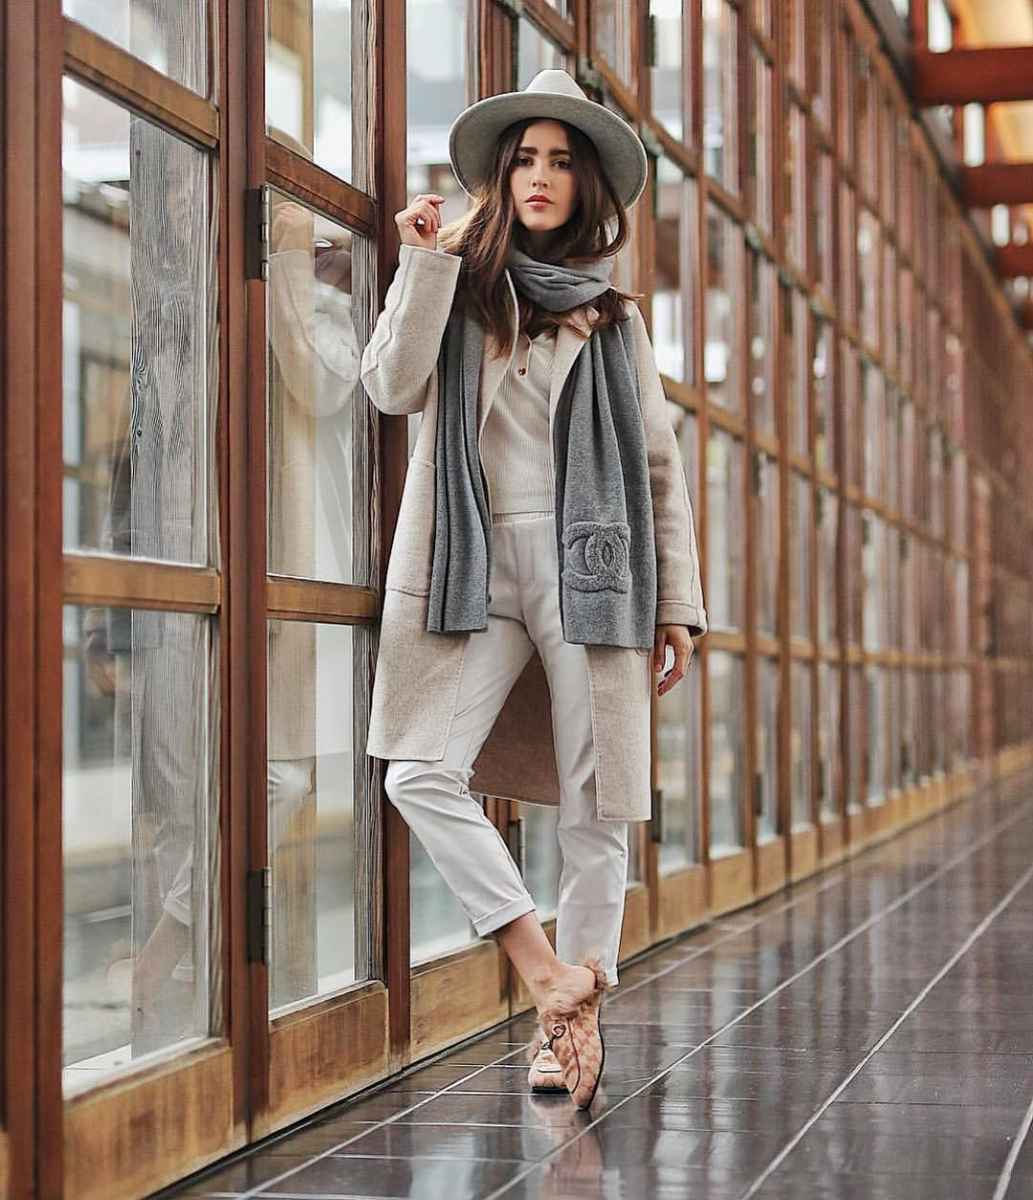 Мода для невысоких осень-зима 2019-2020 фото_43